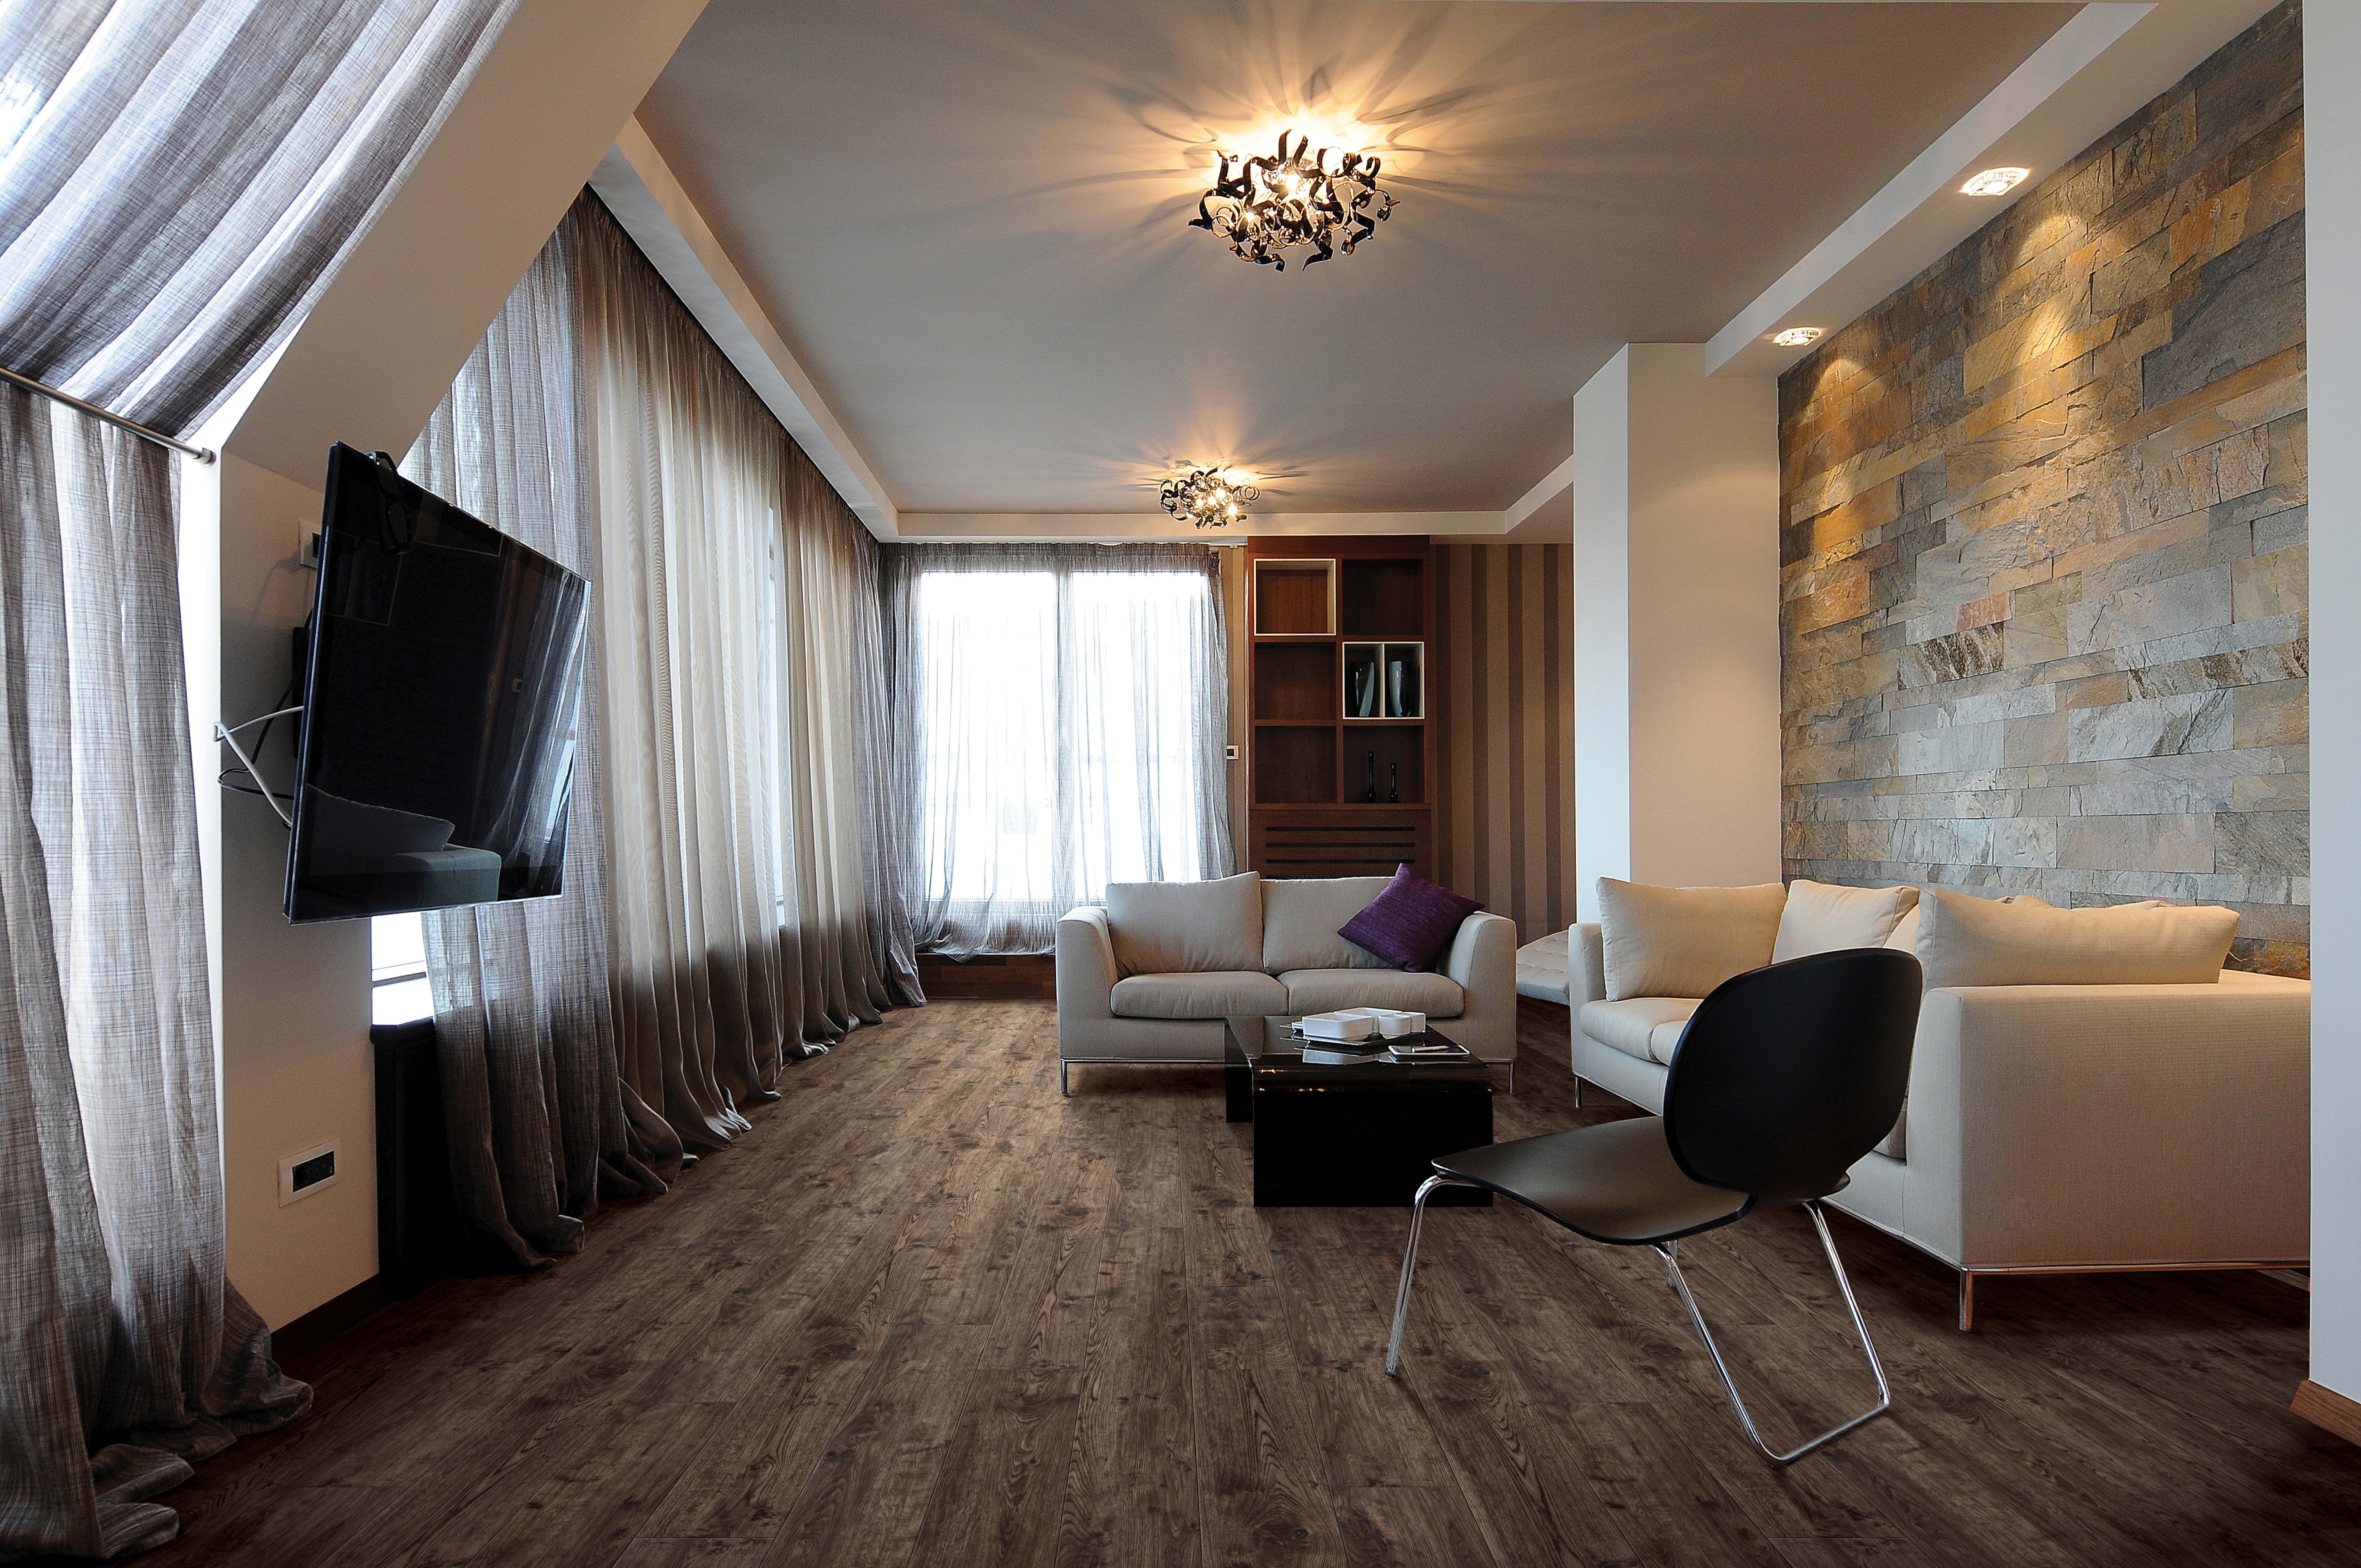 hardwood flooring niagara region of moran oak detail flooring pinterest basements and house throughout moran oak detail